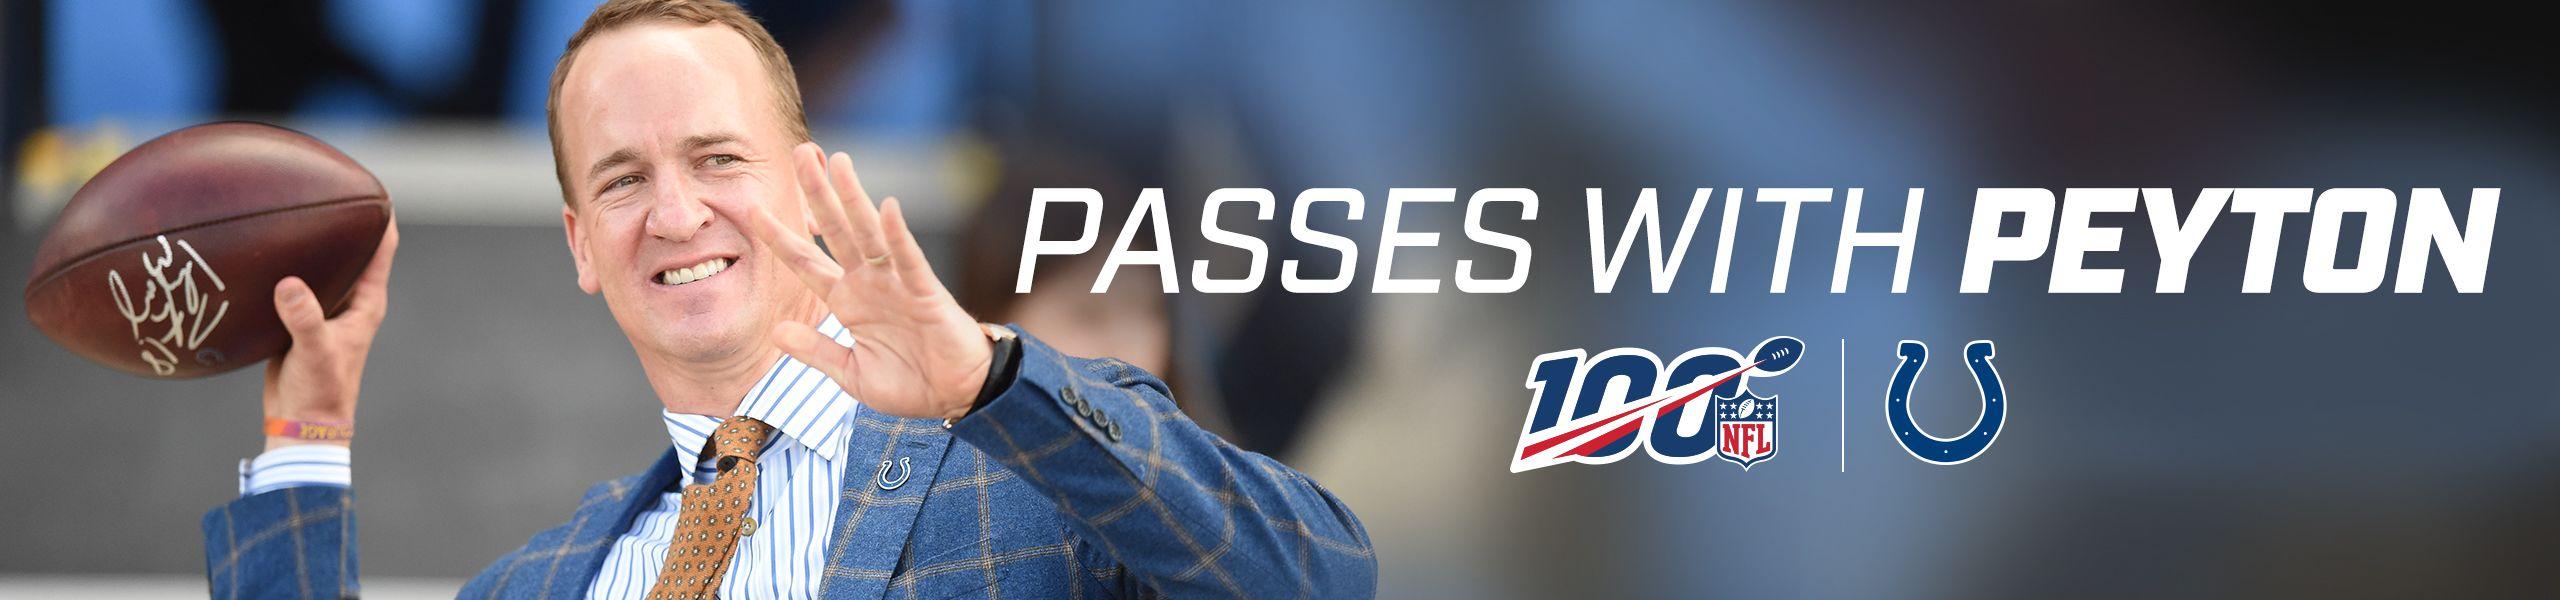 Passes With Peyton